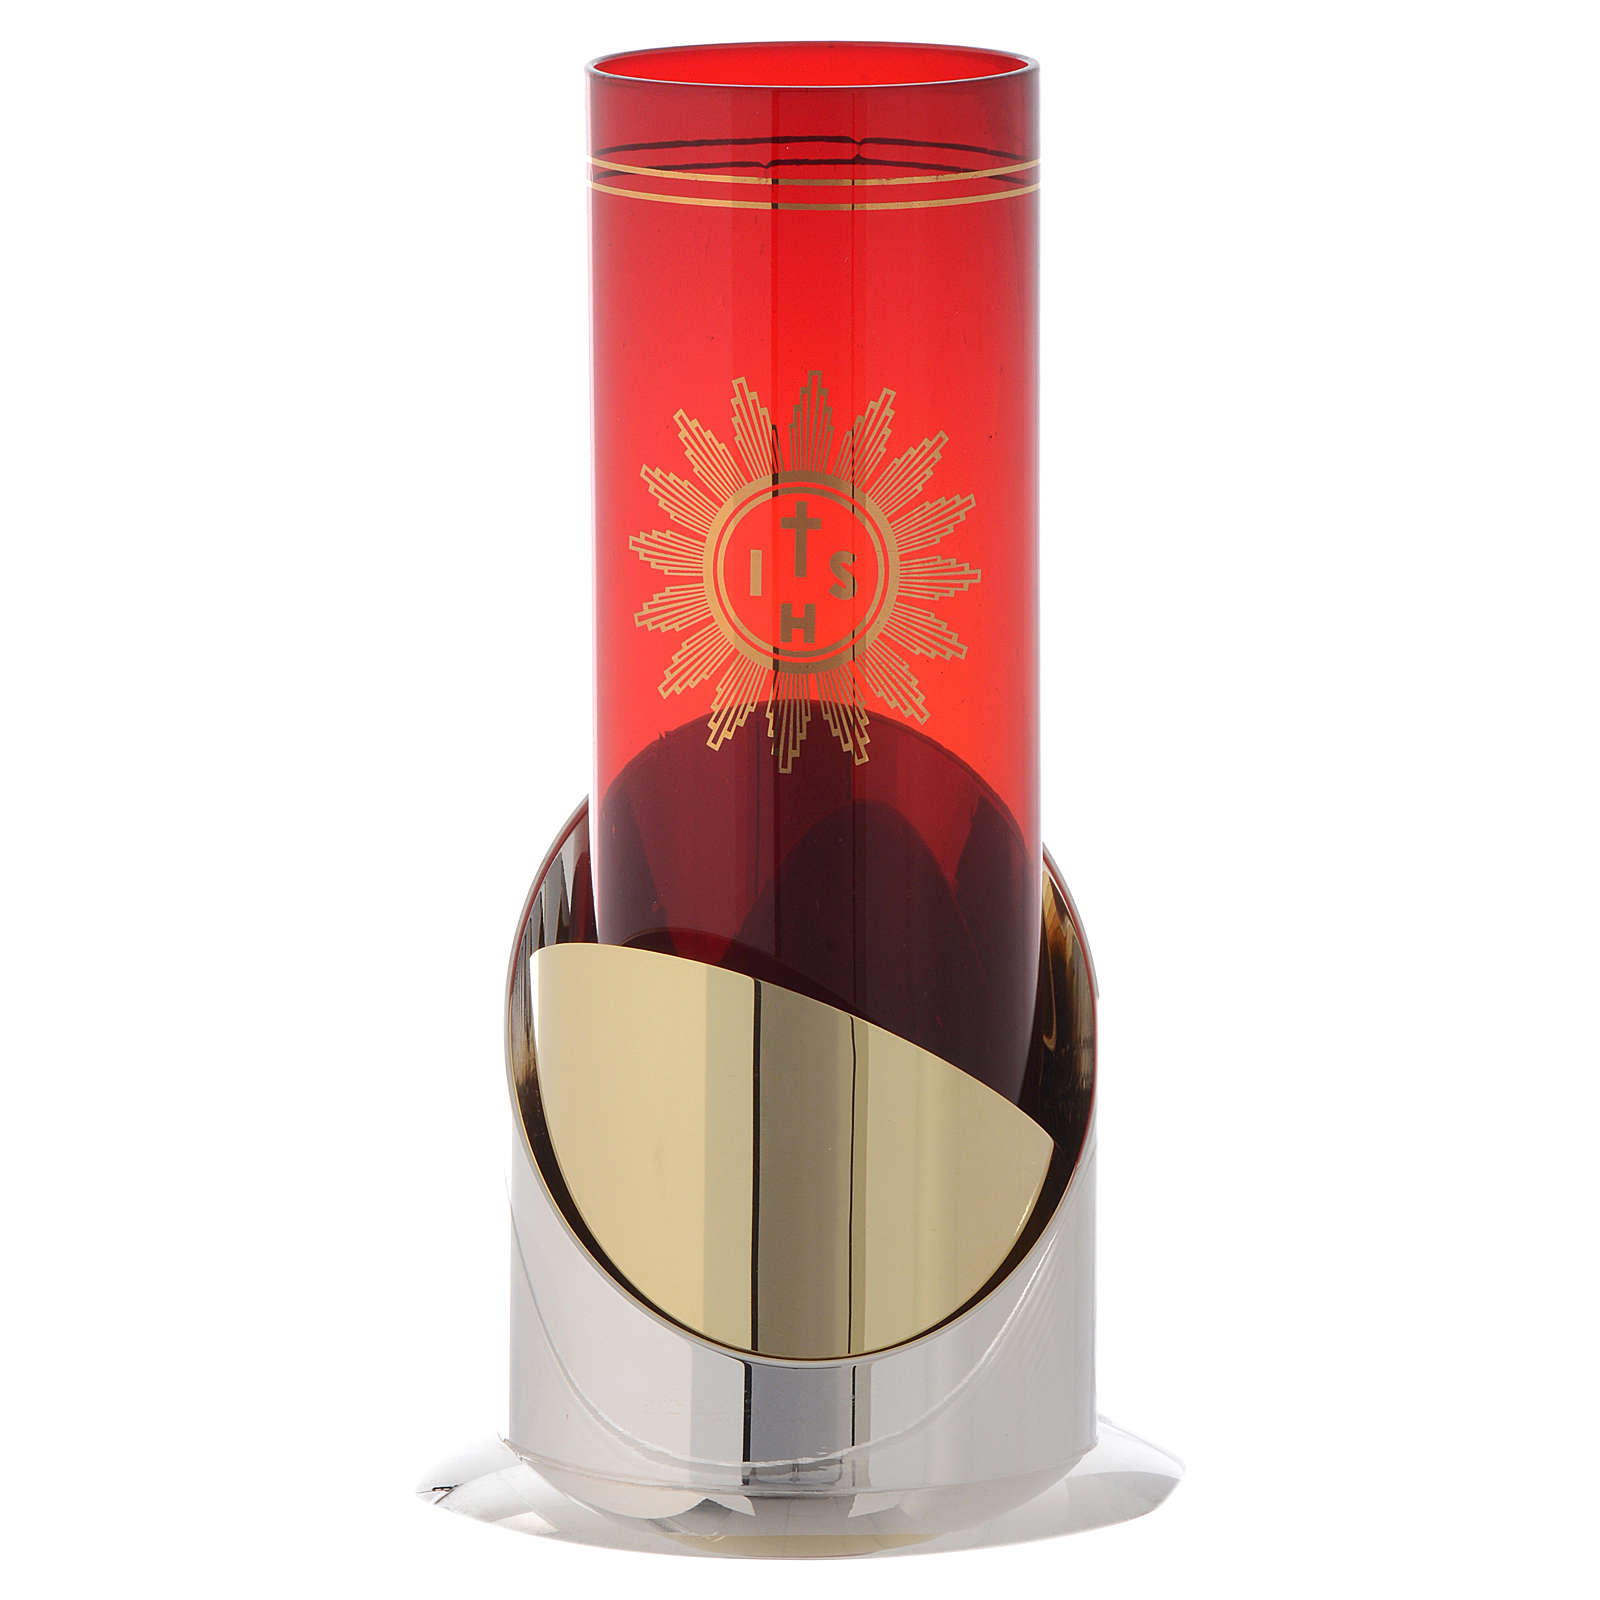 Blessed Sacrament, Lux model 3